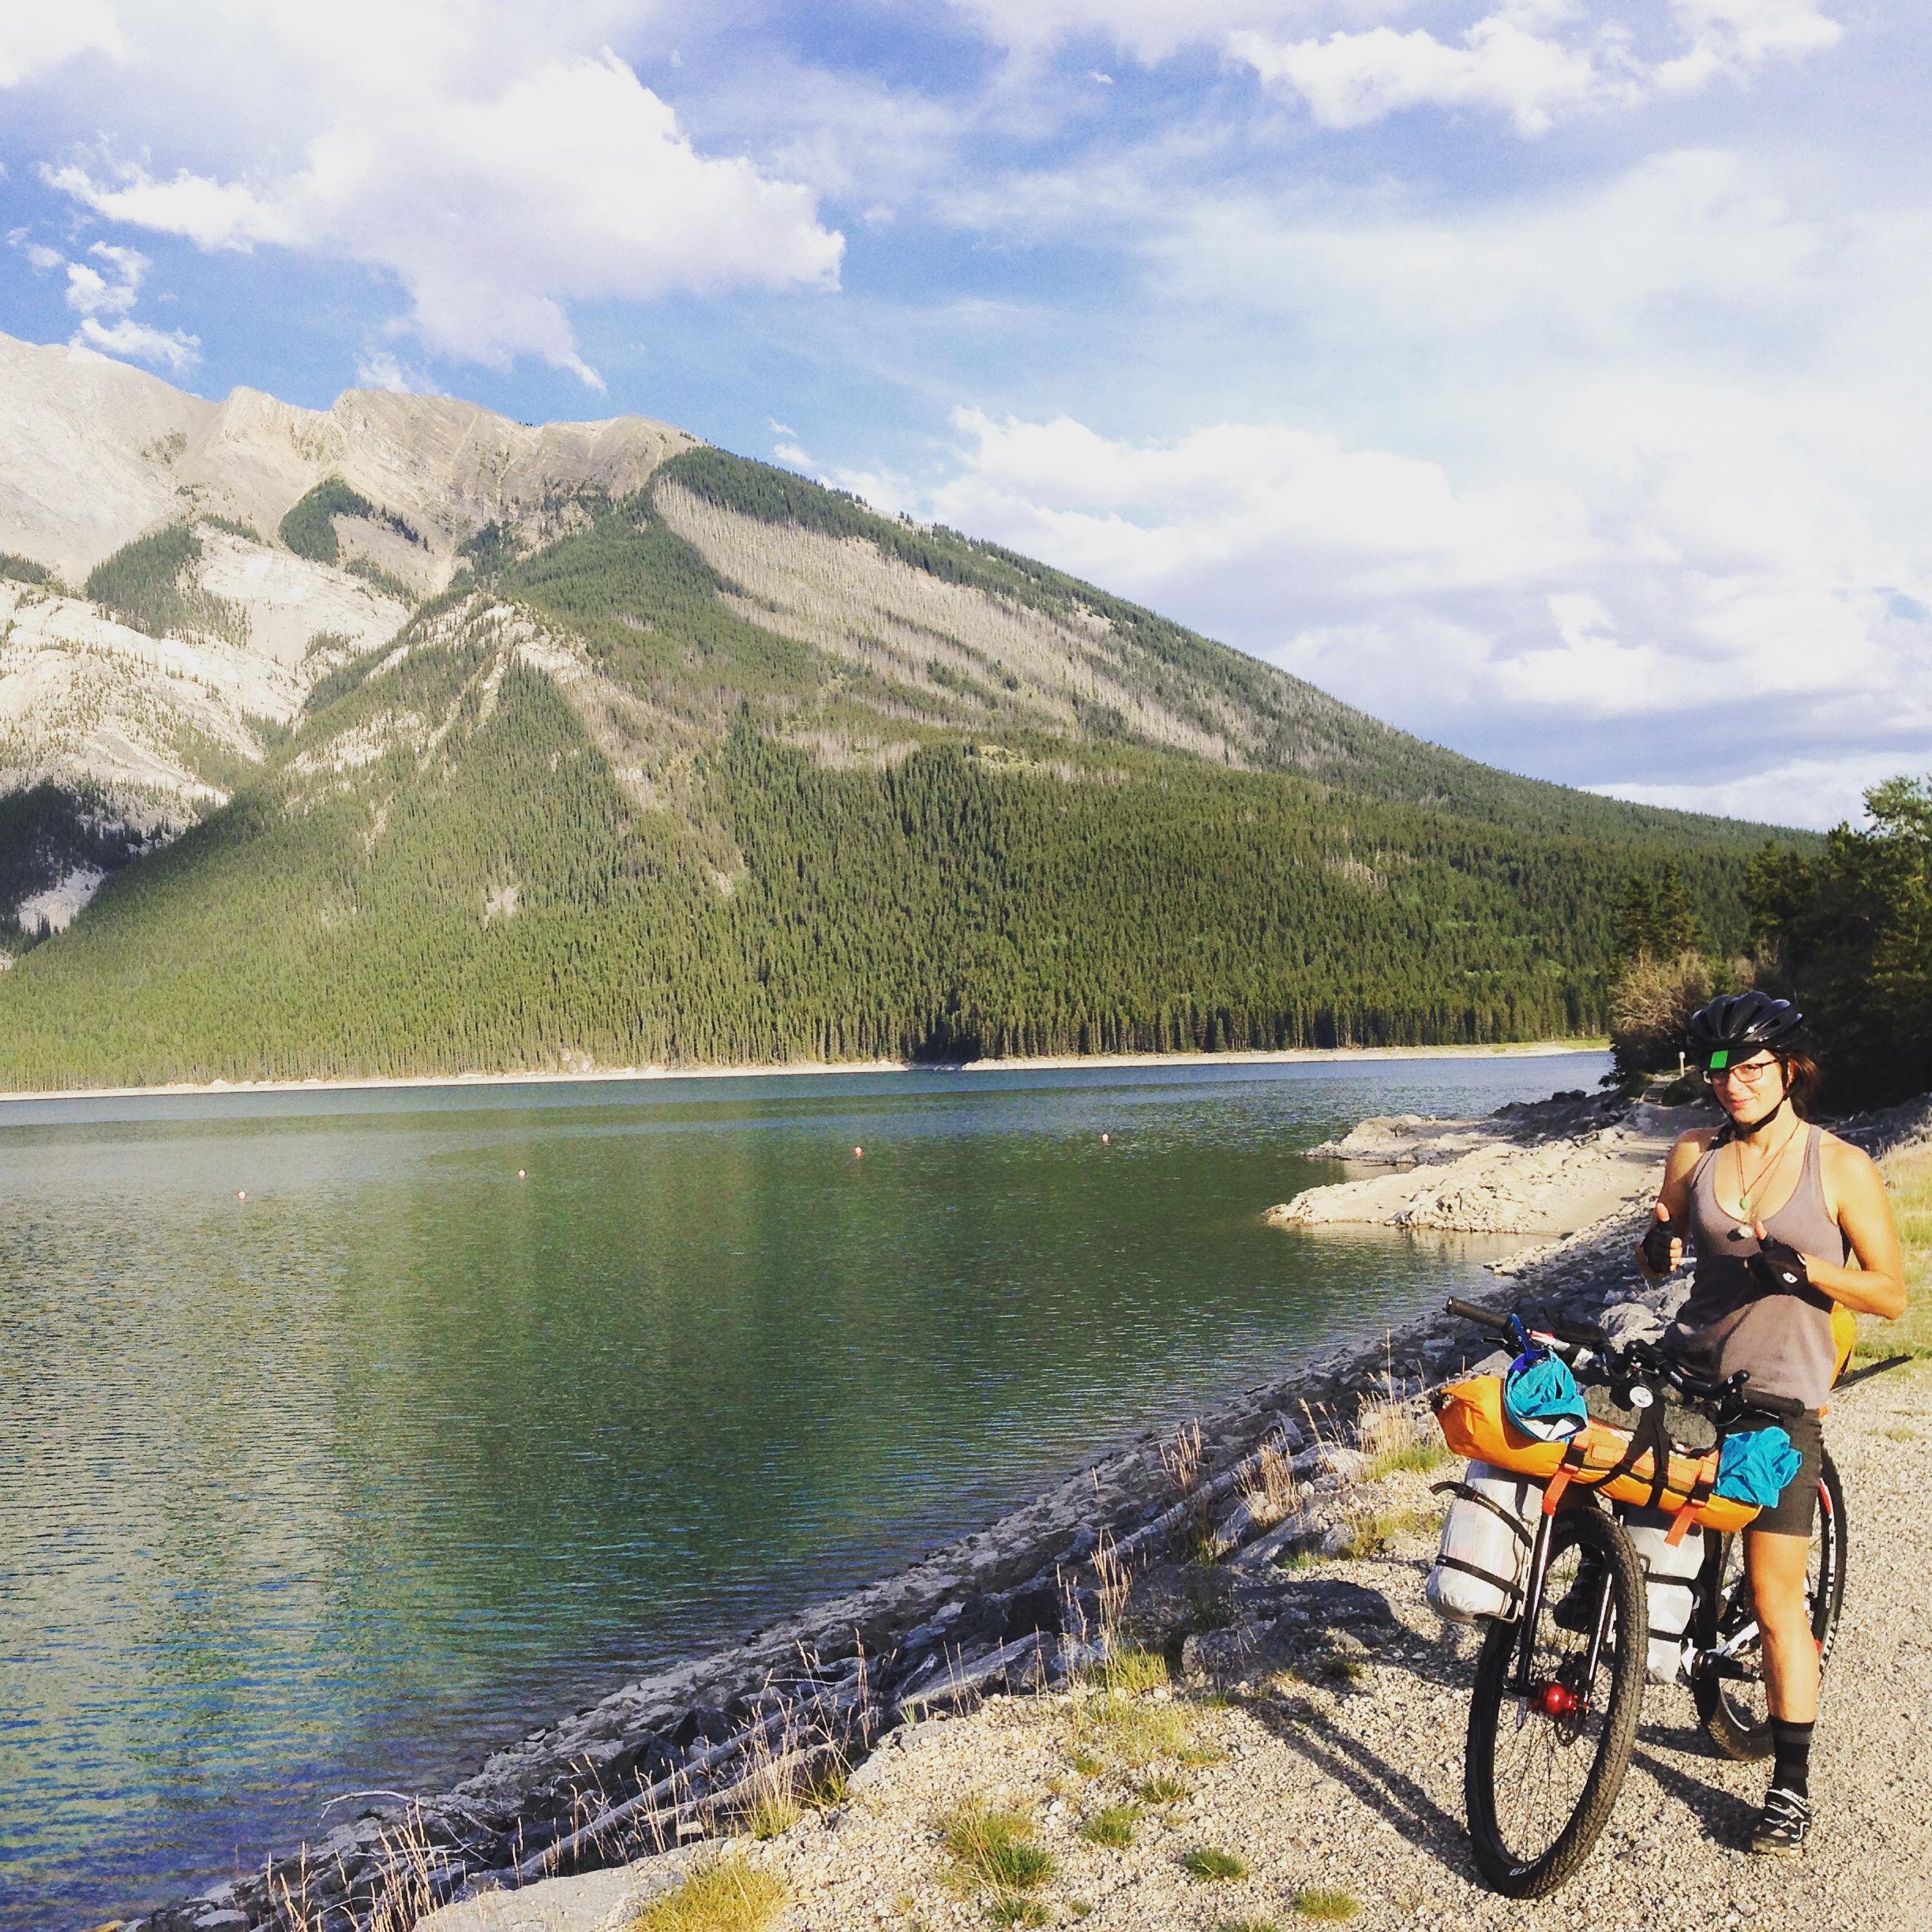 Getting ready to roll around Lake Minnewanka, near Banff